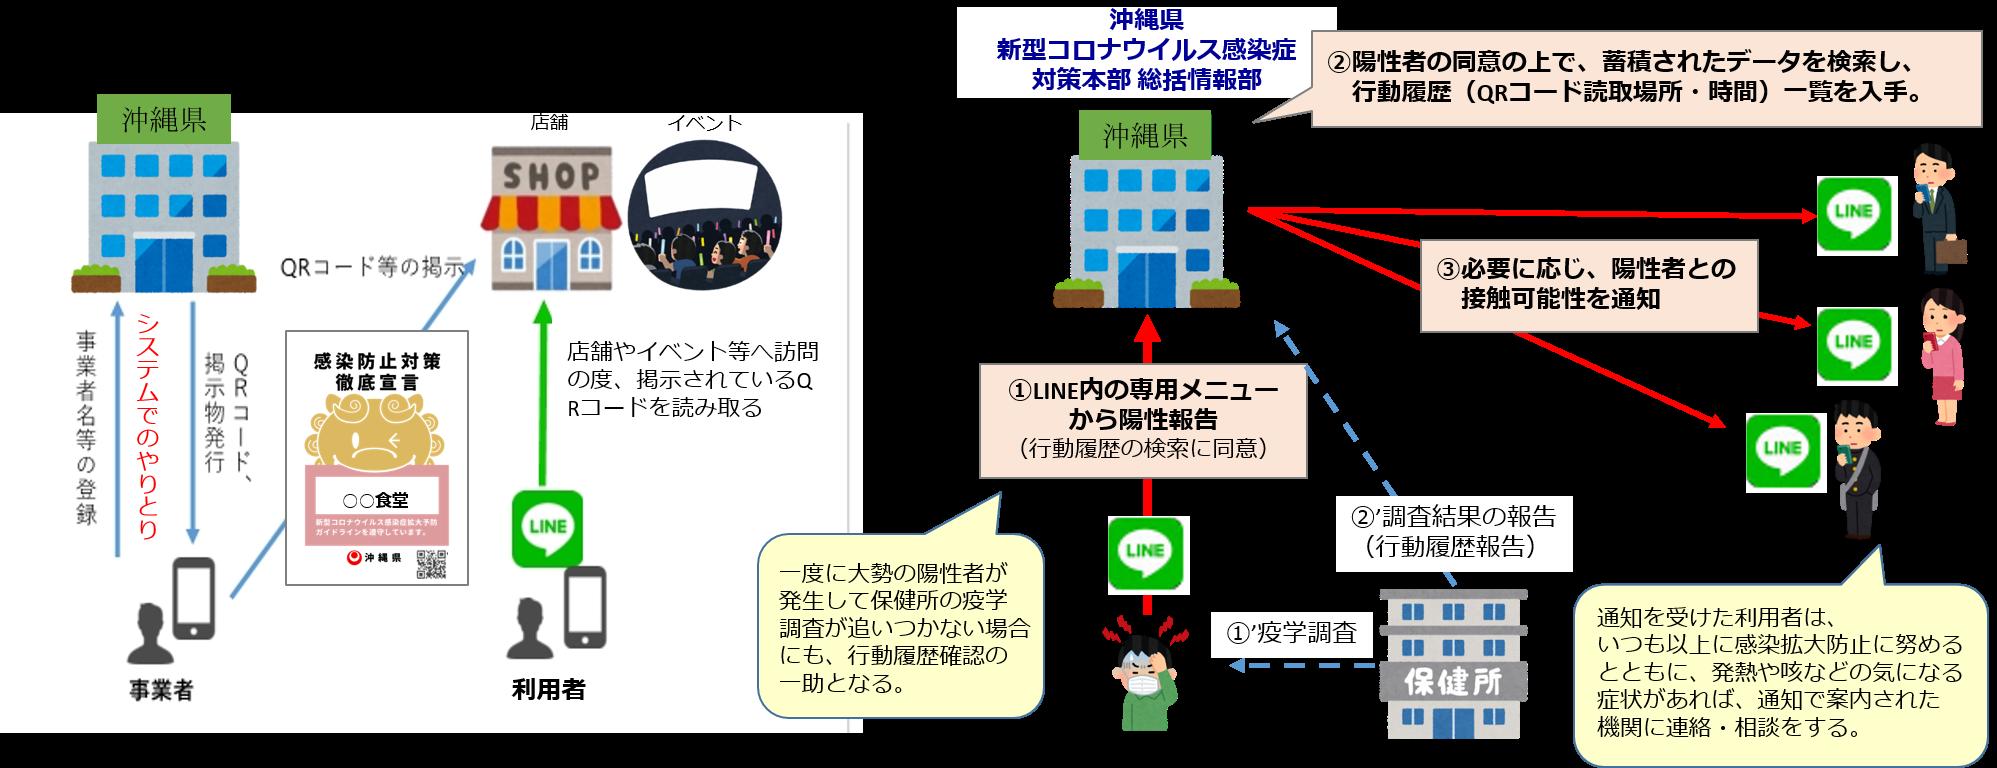 /stf/linecorp/ja/csr/RICCA_image.png